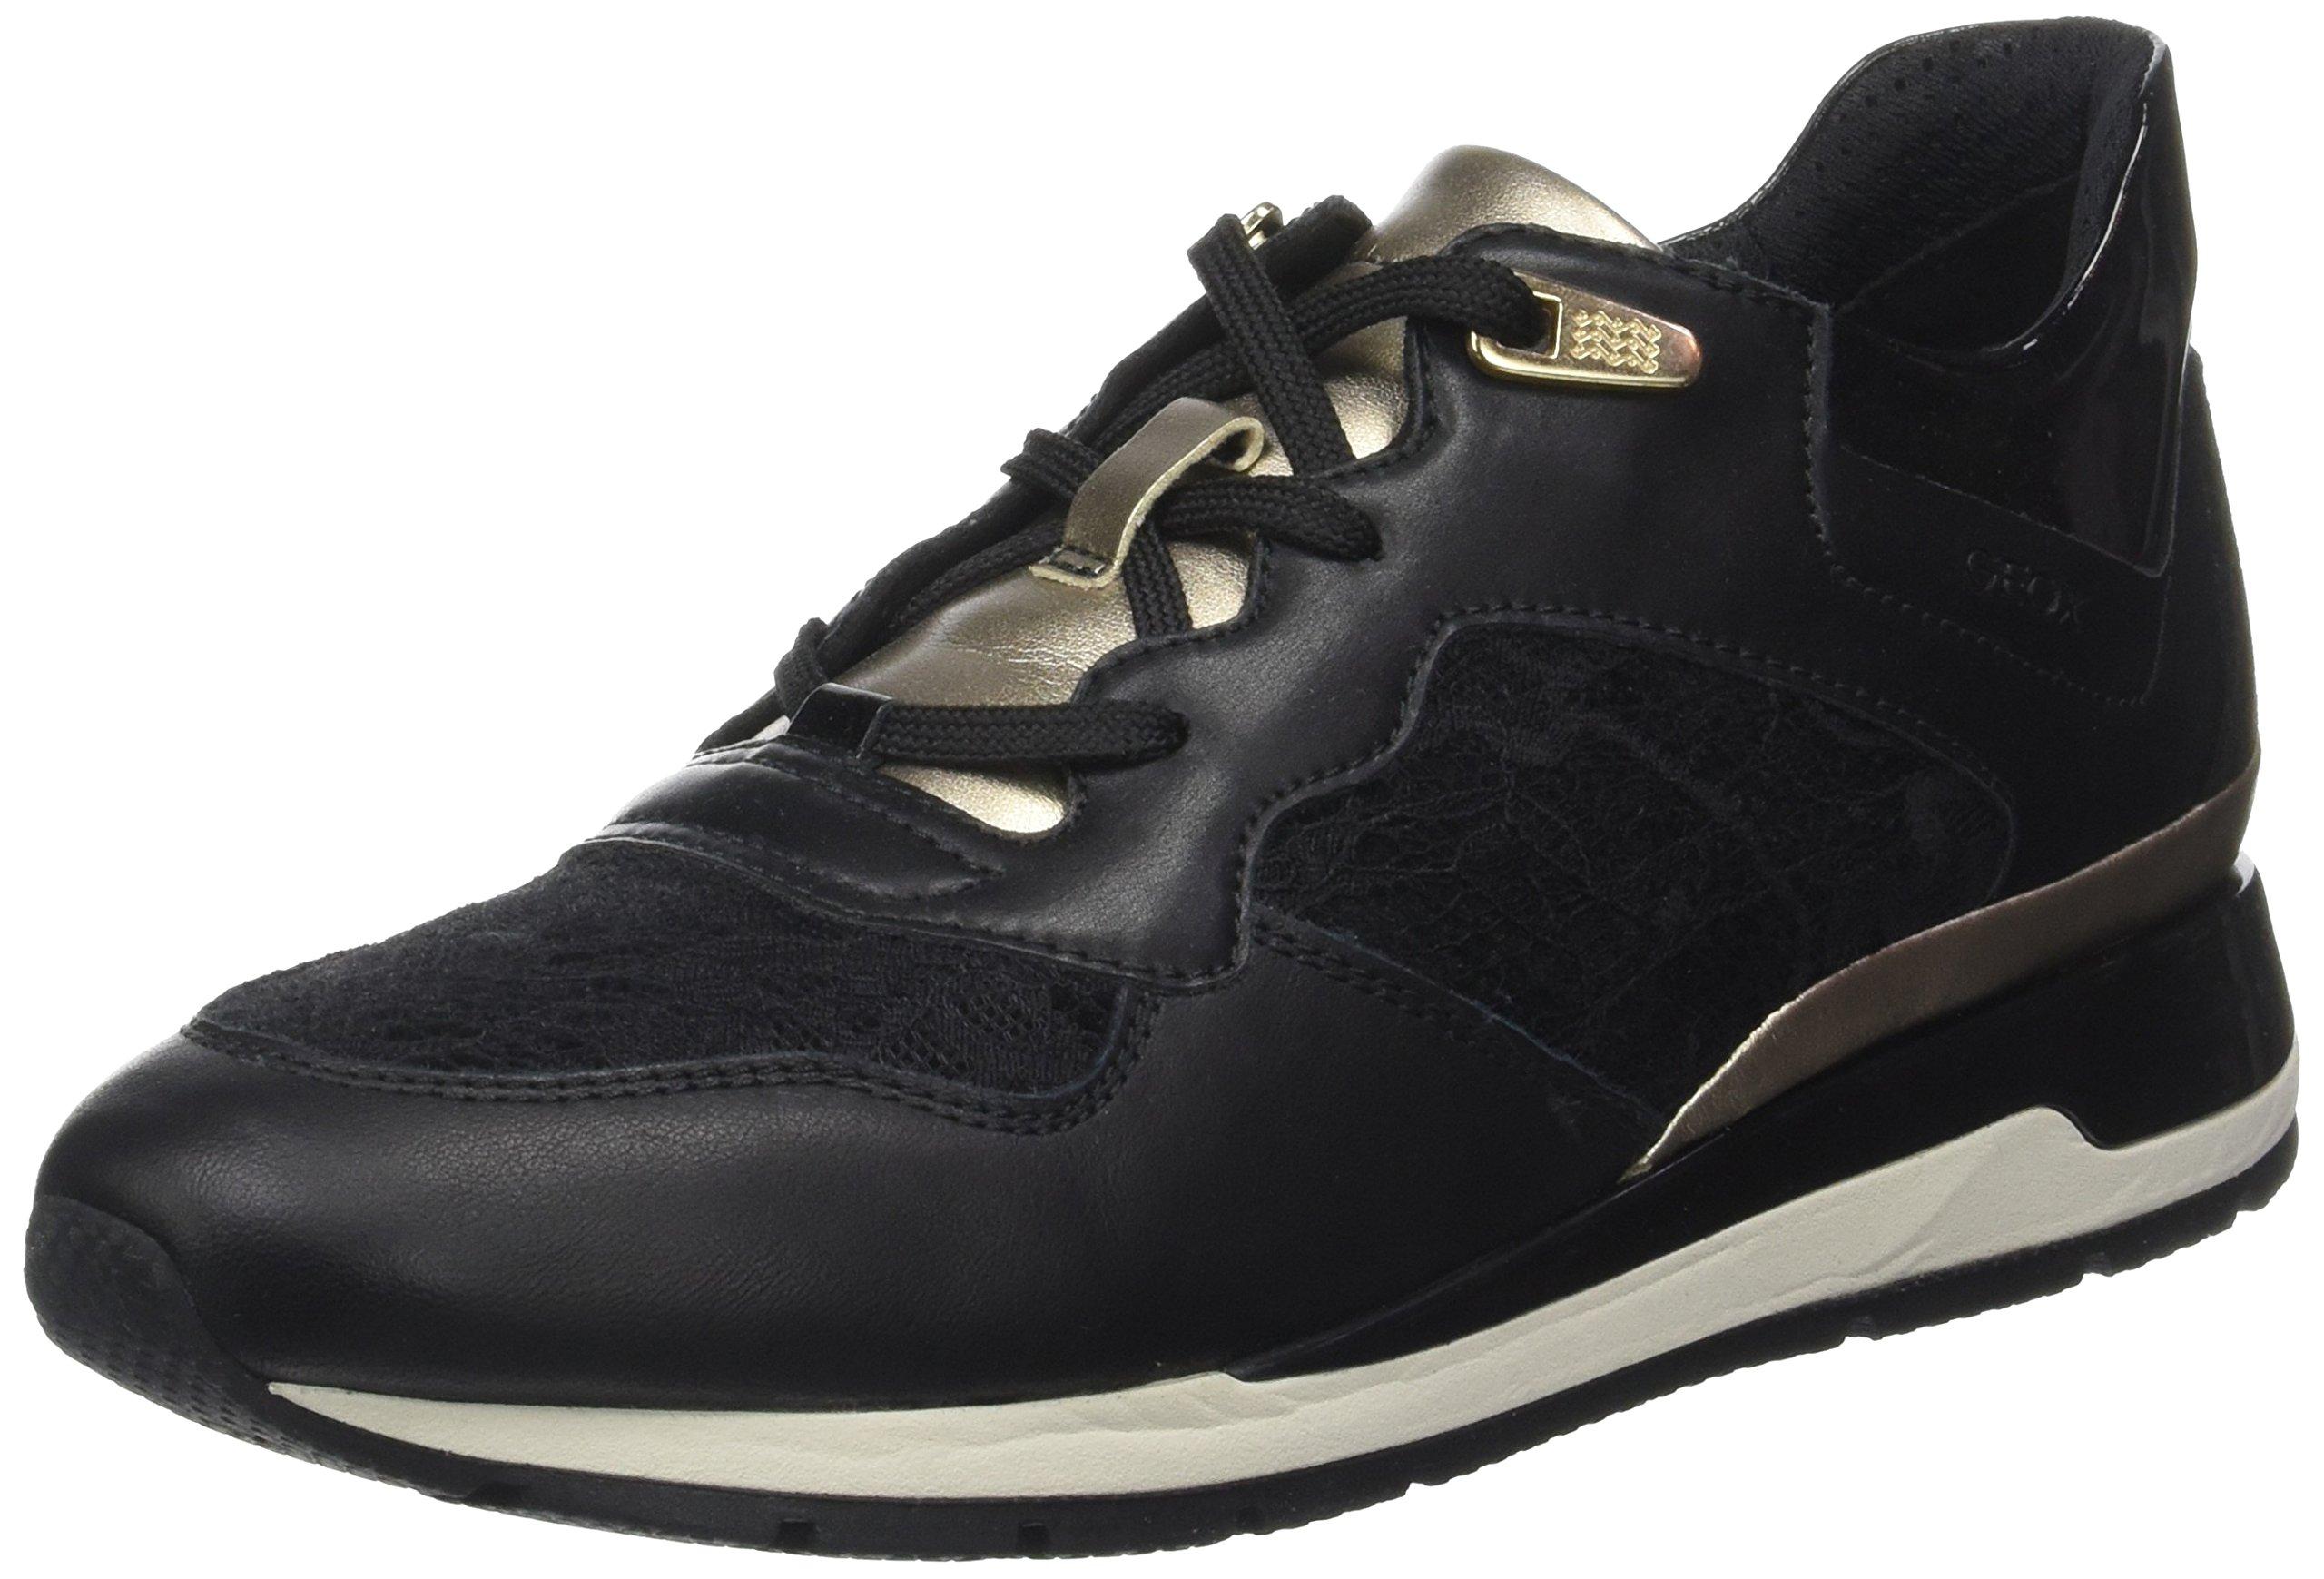 FemmeNoirblack35 D Basses Eu Geox BSneakers Shahira LqUGMVSzp